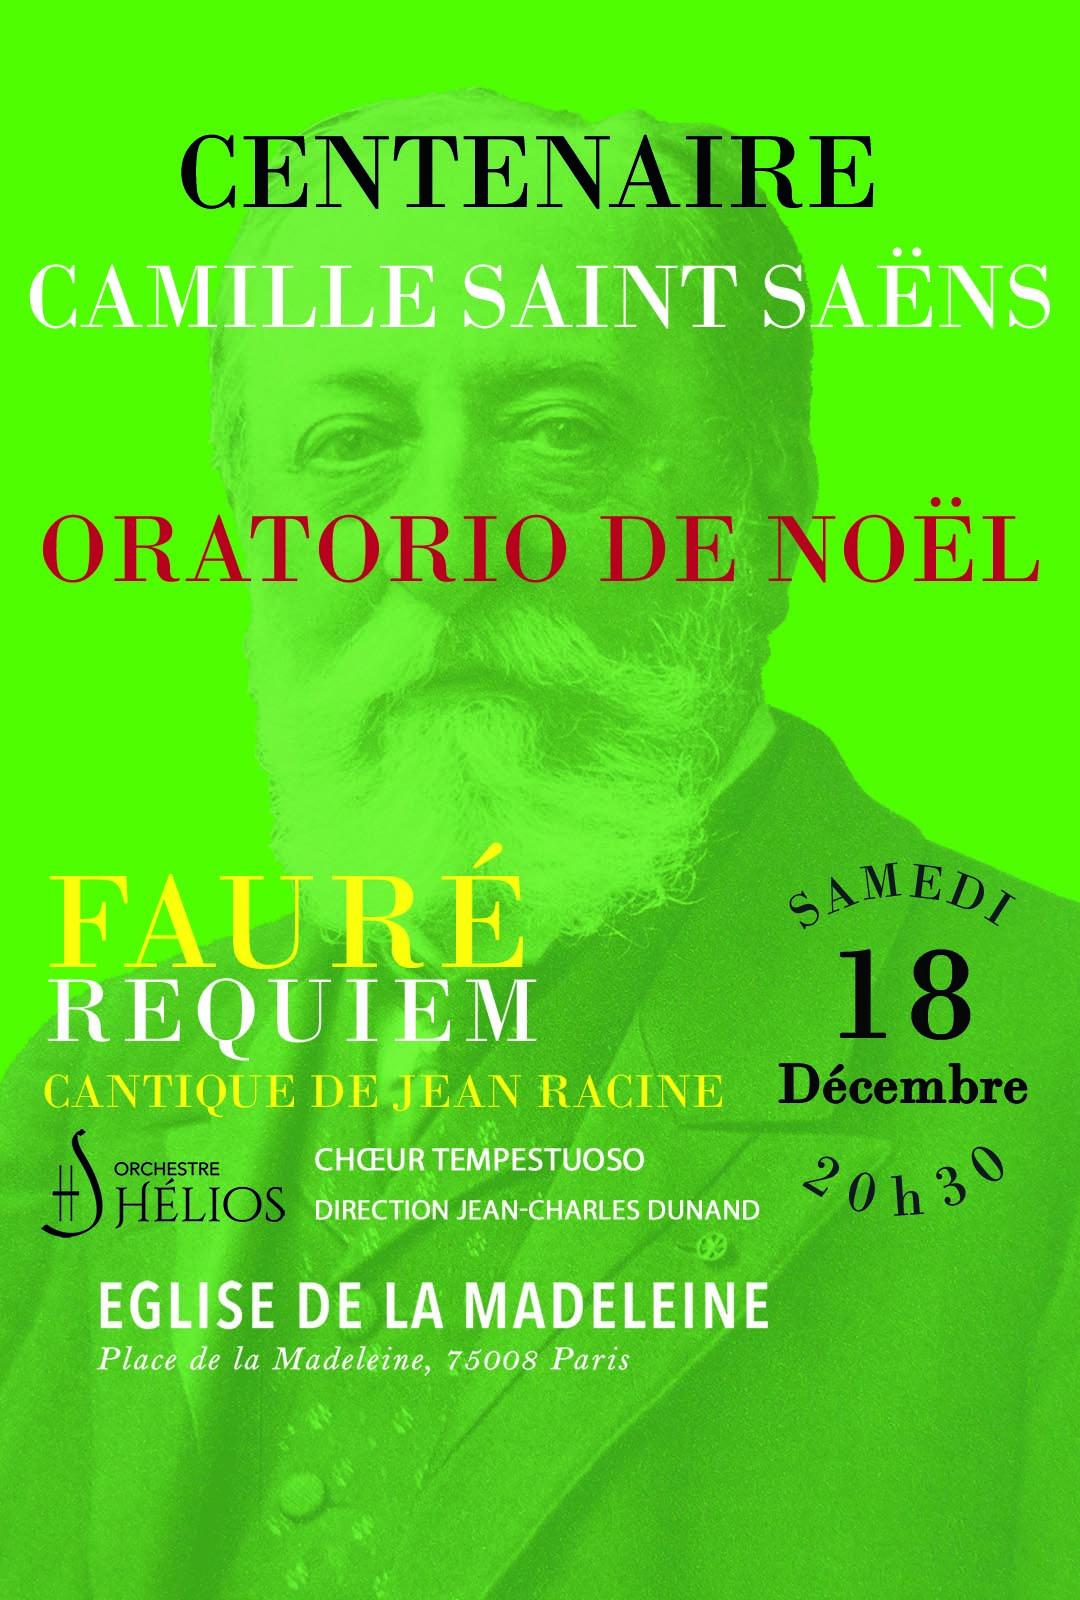 Oratorio de Noël de Camille Saint-Saëns